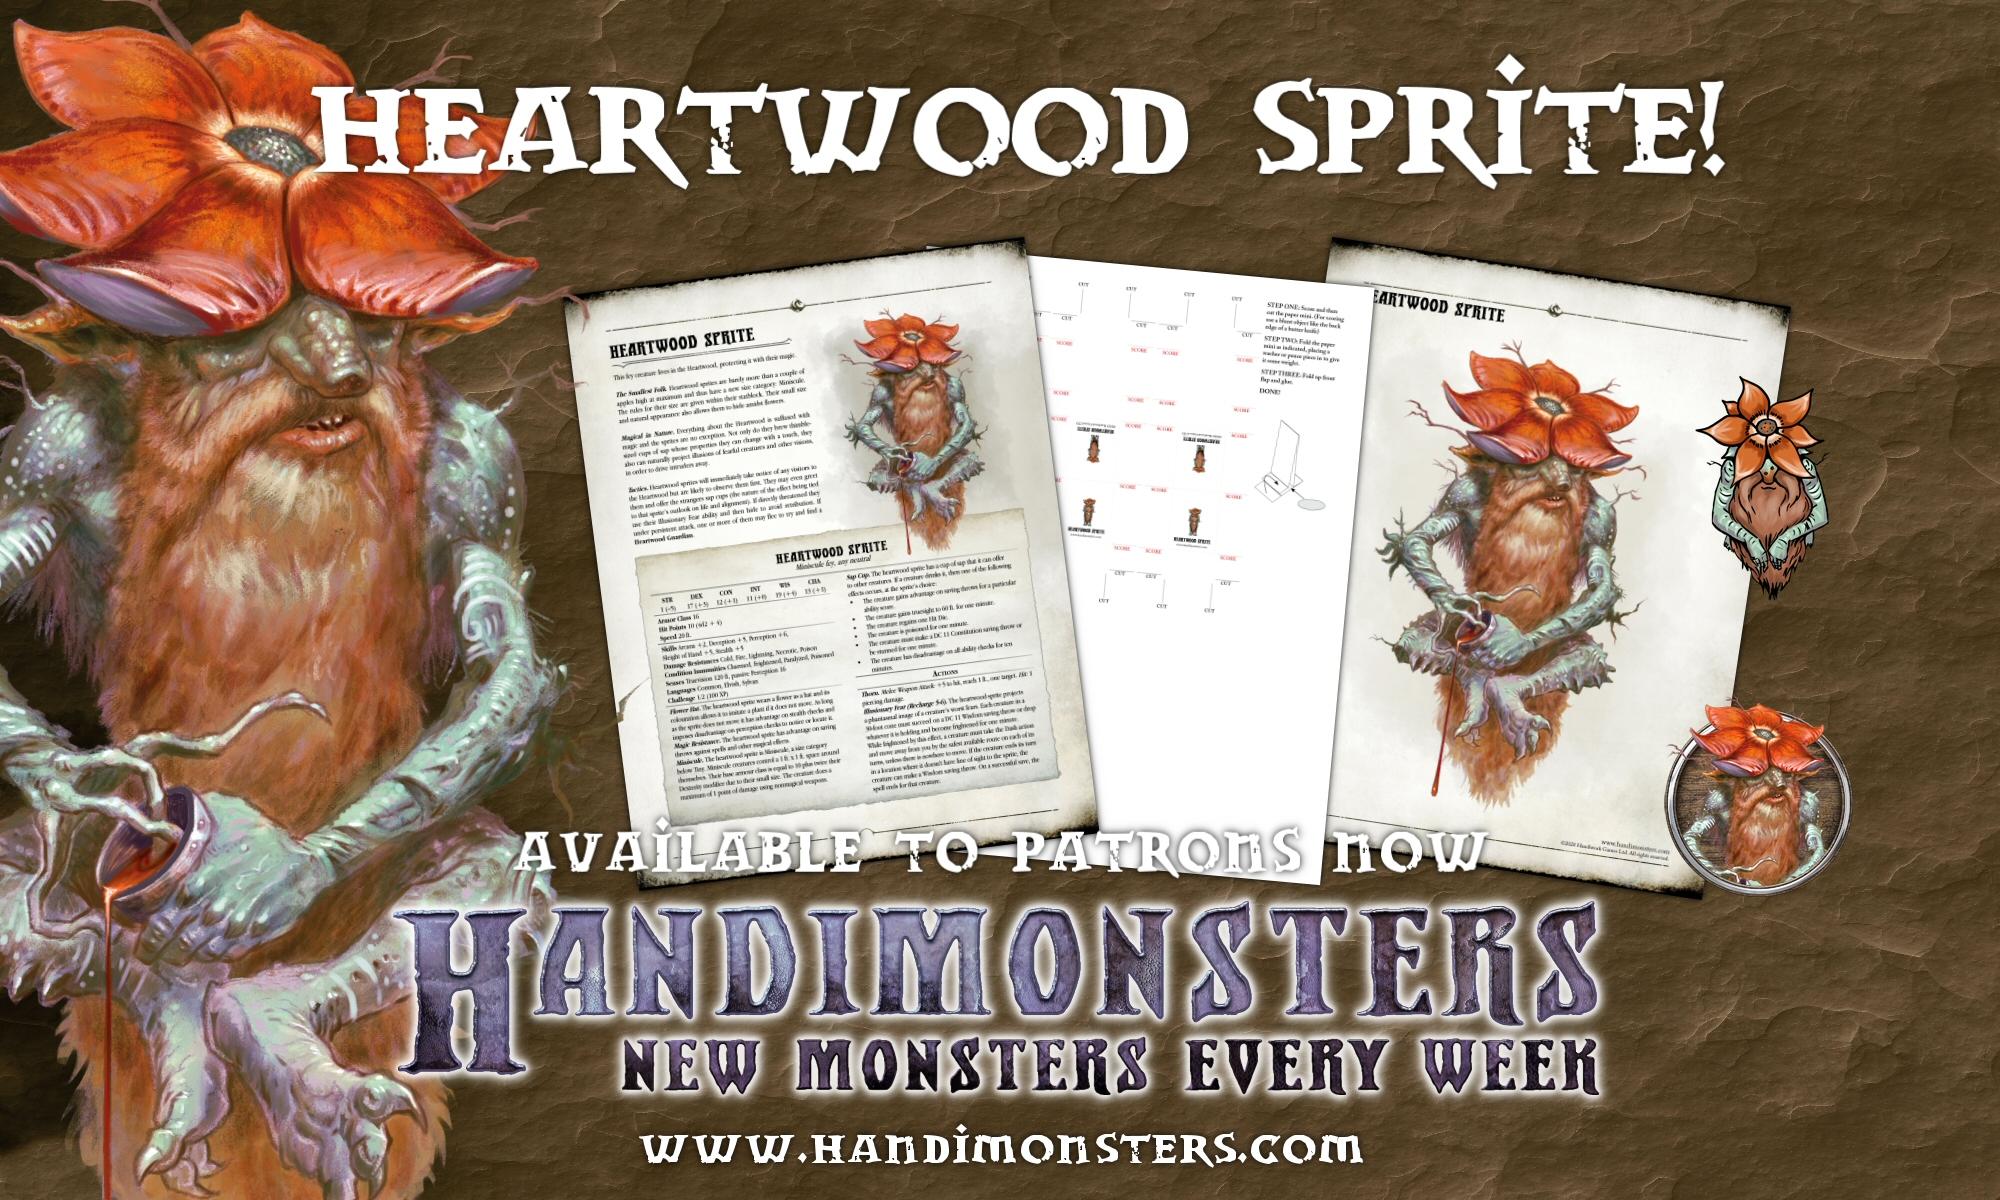 Heartwood-Sprite-FB-ad.jpg